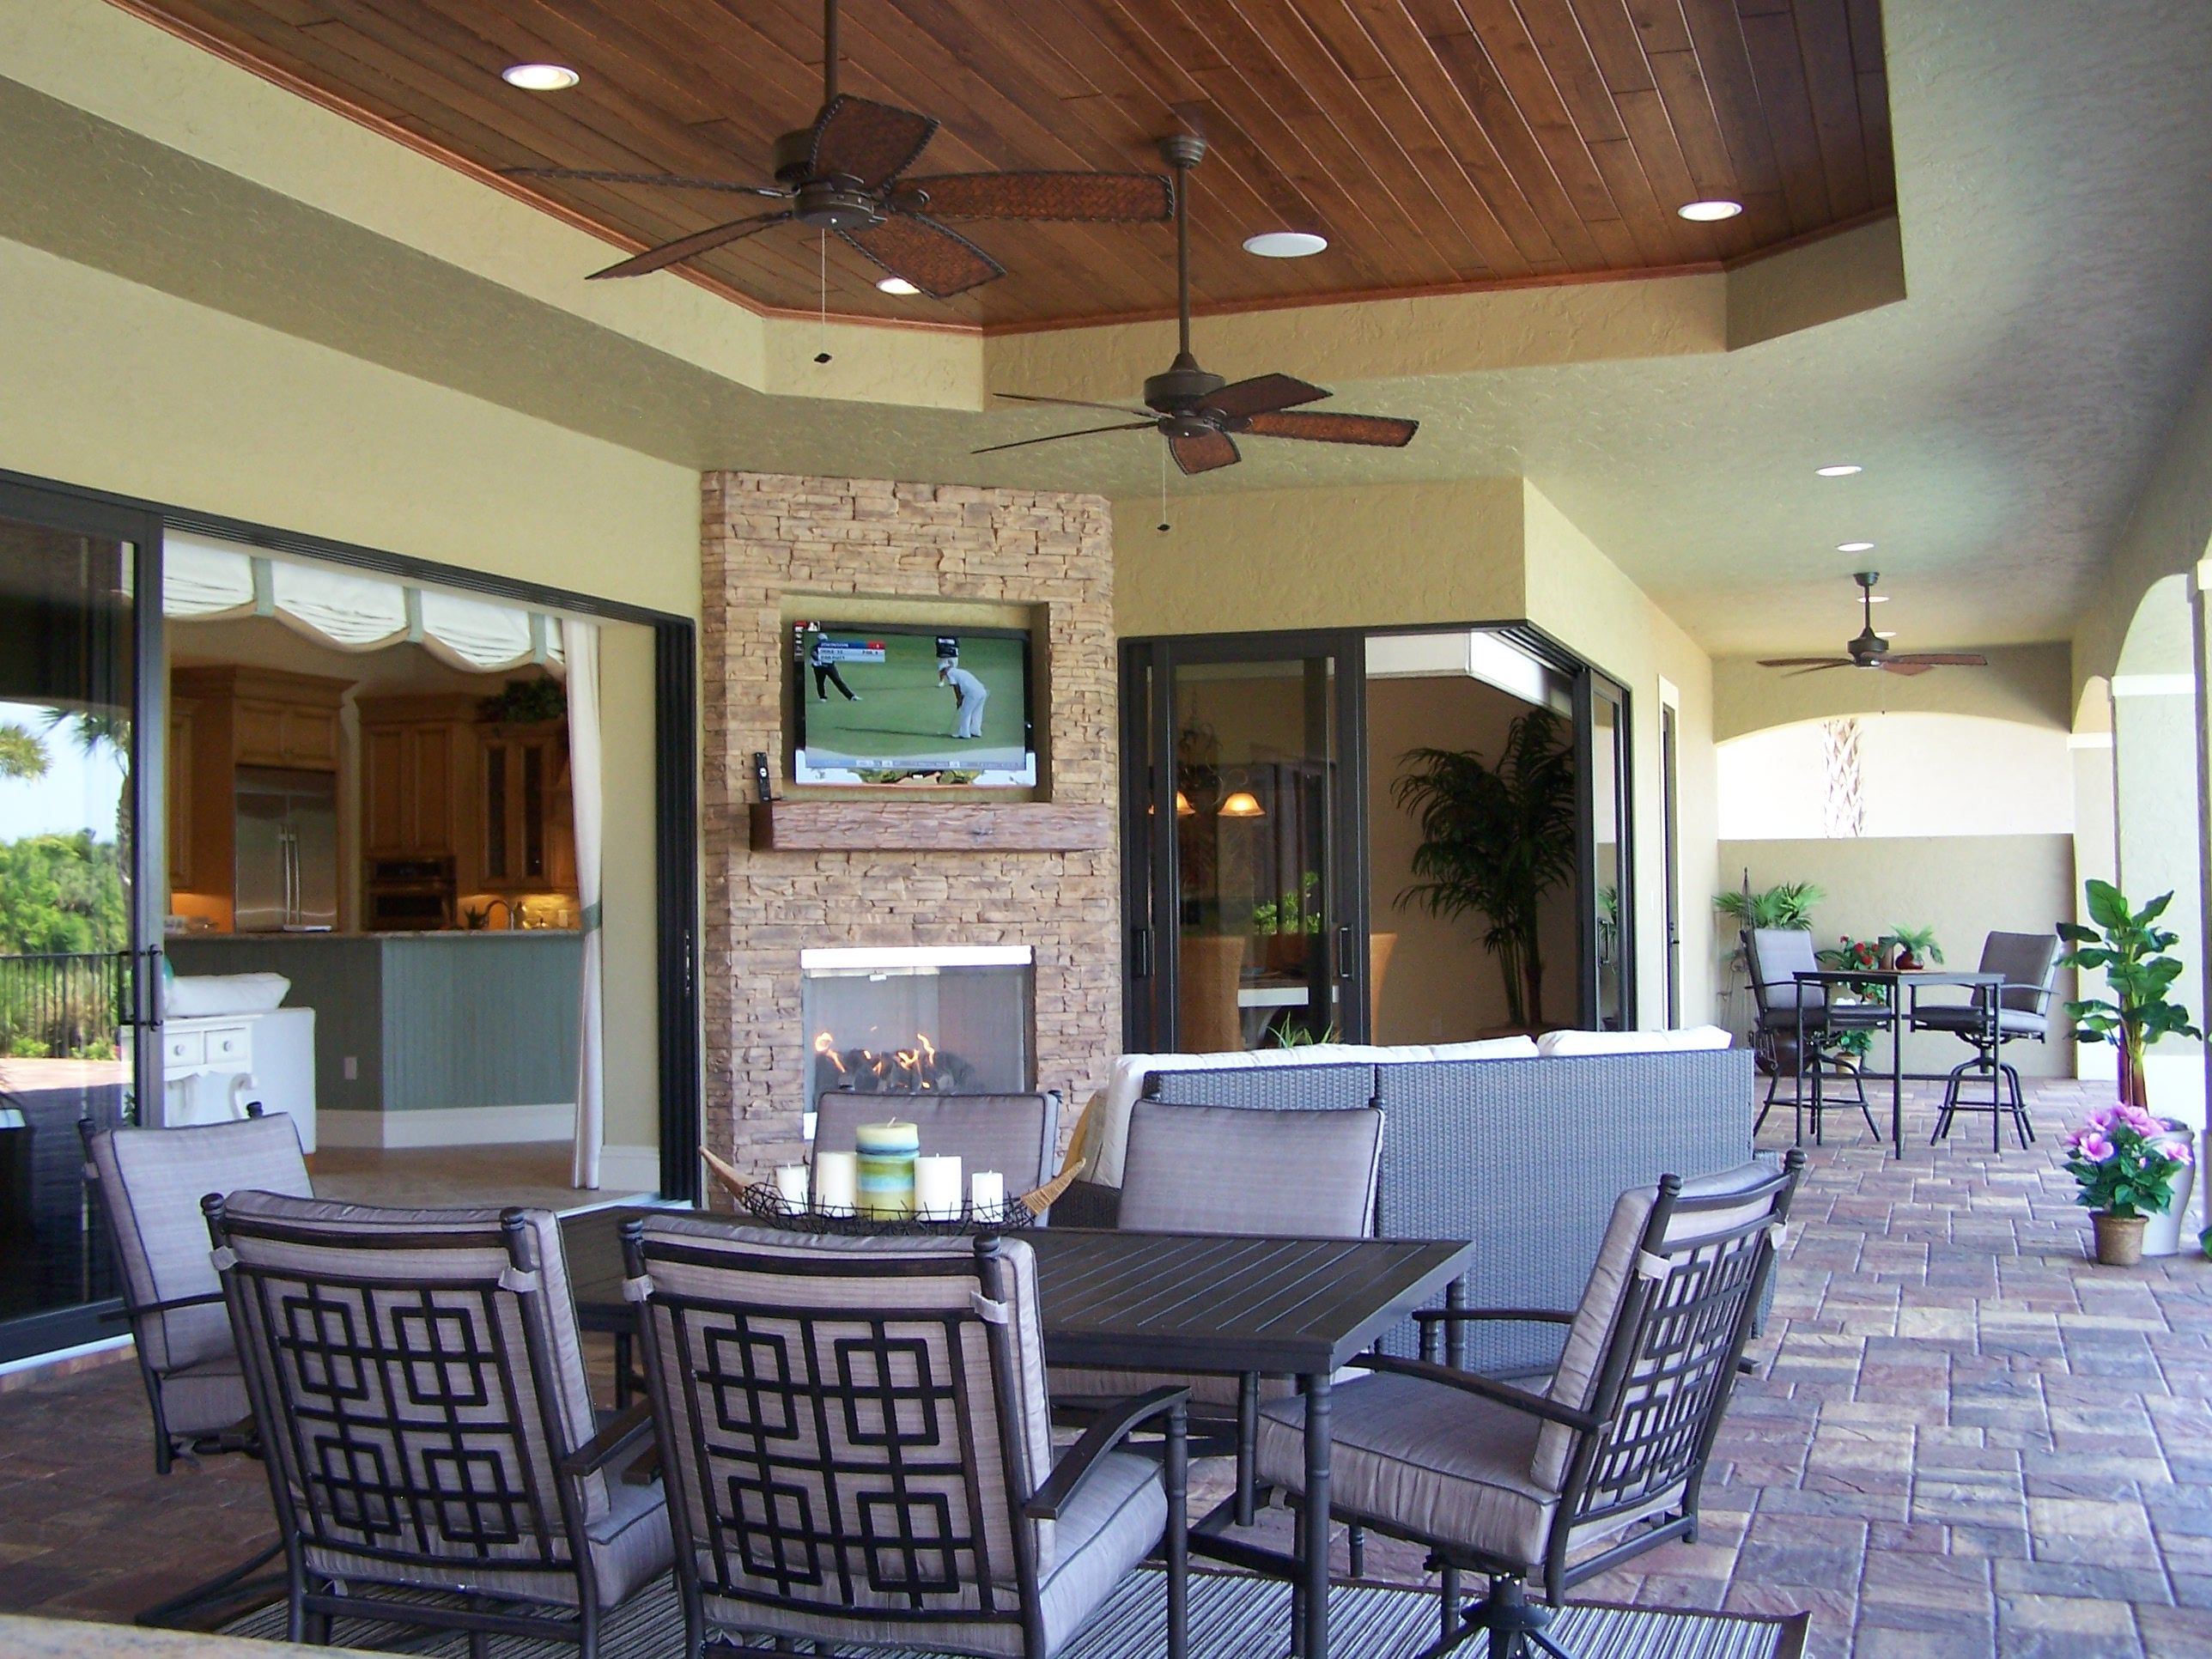 great room designer island kitchen outdoor living room expansive lanai outdoor living rooms on outdoor kitchen and living space id=76295